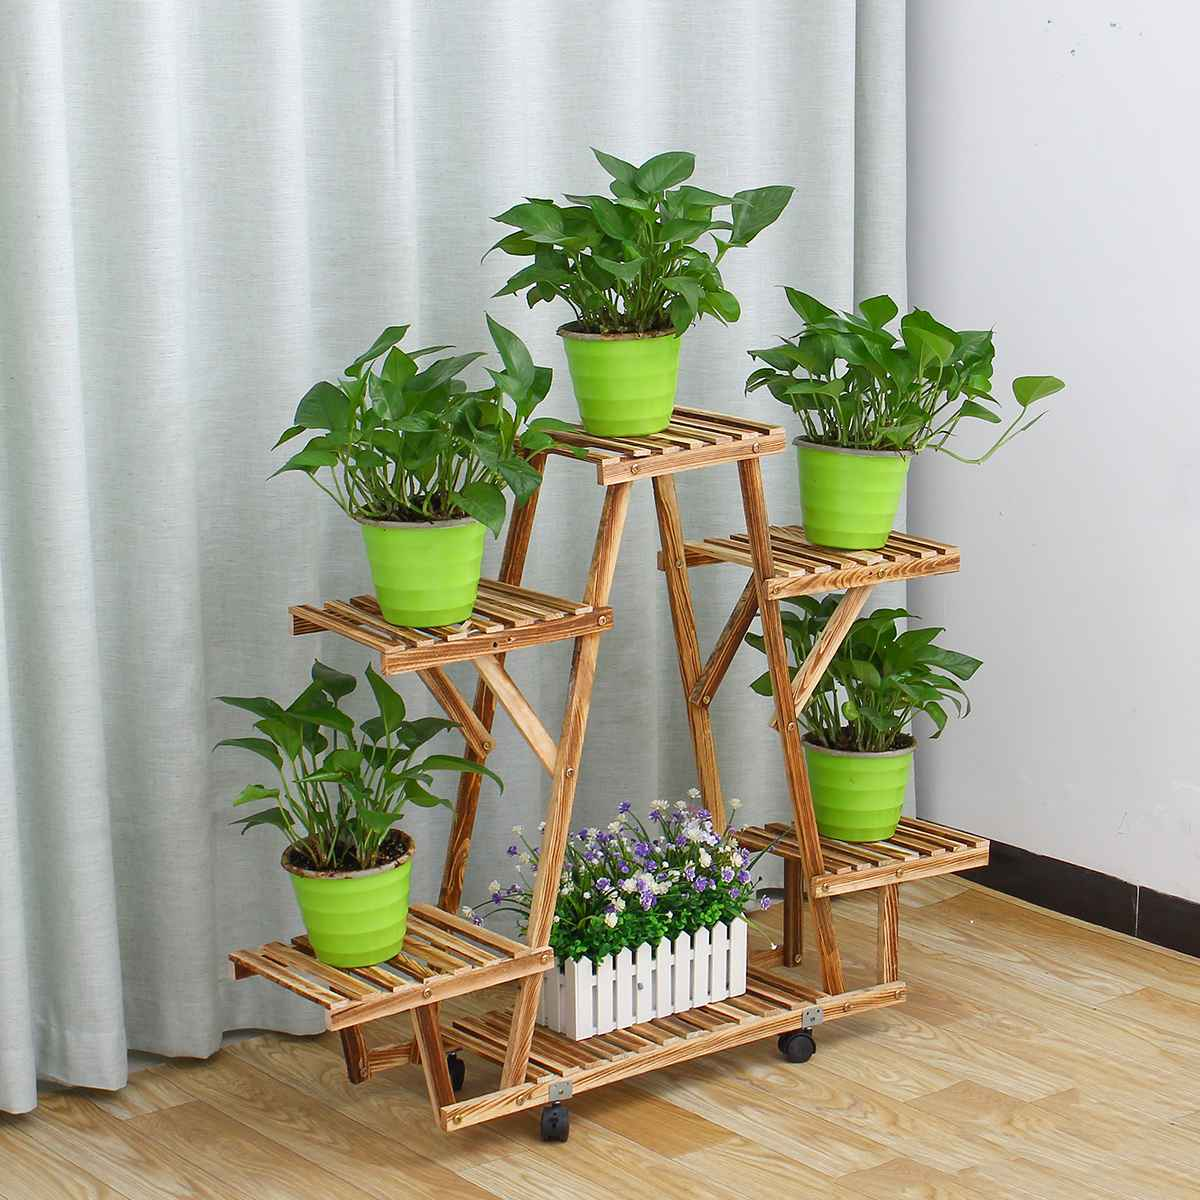 Wooden Plant Stand Indoor Outdoor Patio Garden Planter Flower Pot Stand Shelf